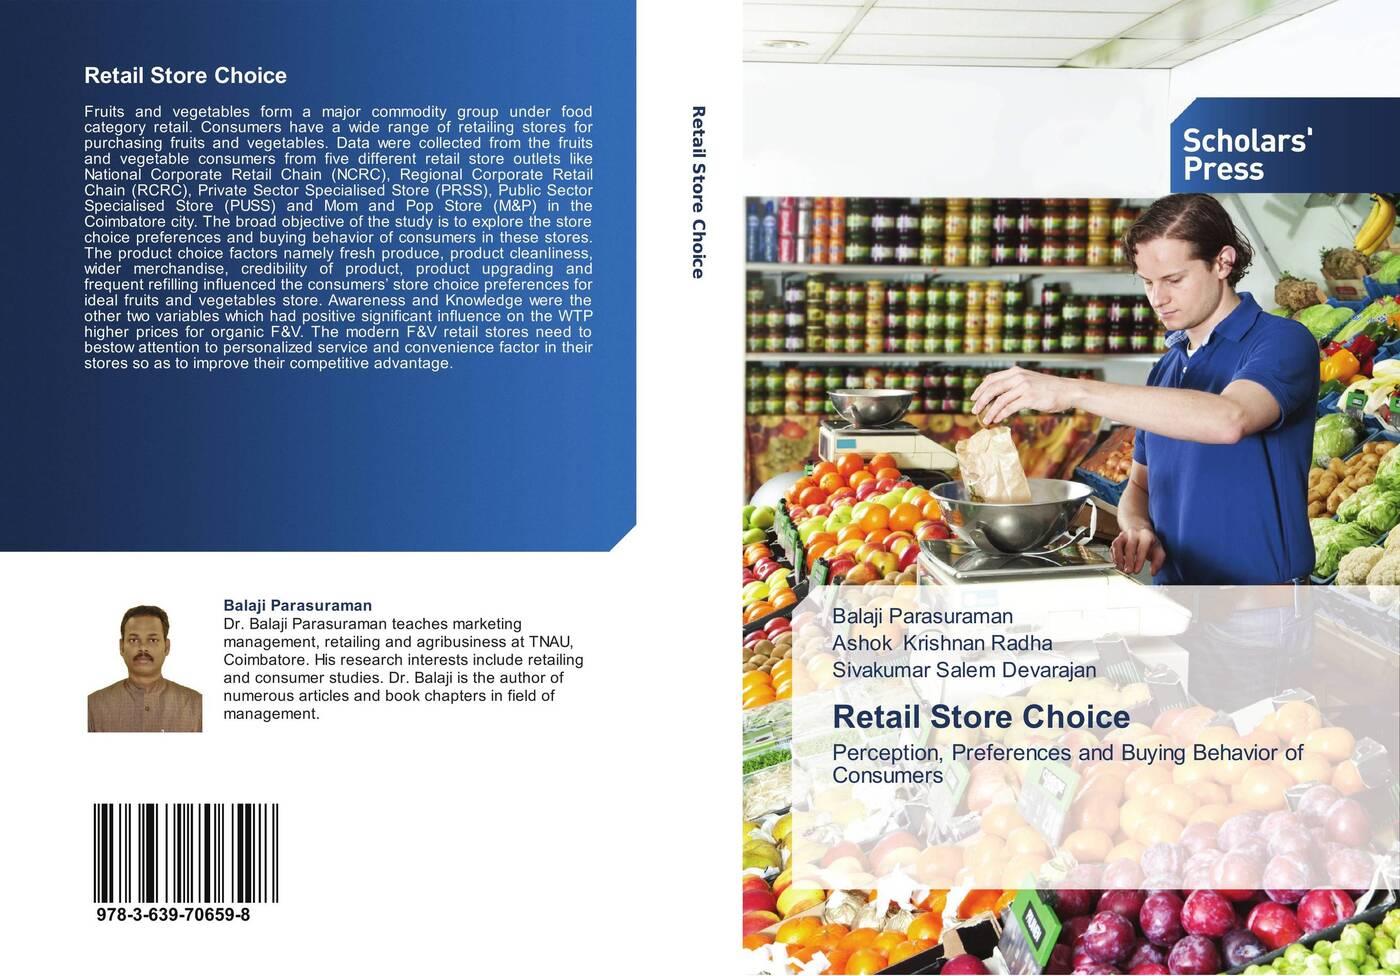 Balaji Parasuraman,Ashok Krishnan Radha and Sivakumar Salem Devarajan Retail Store Choice the store